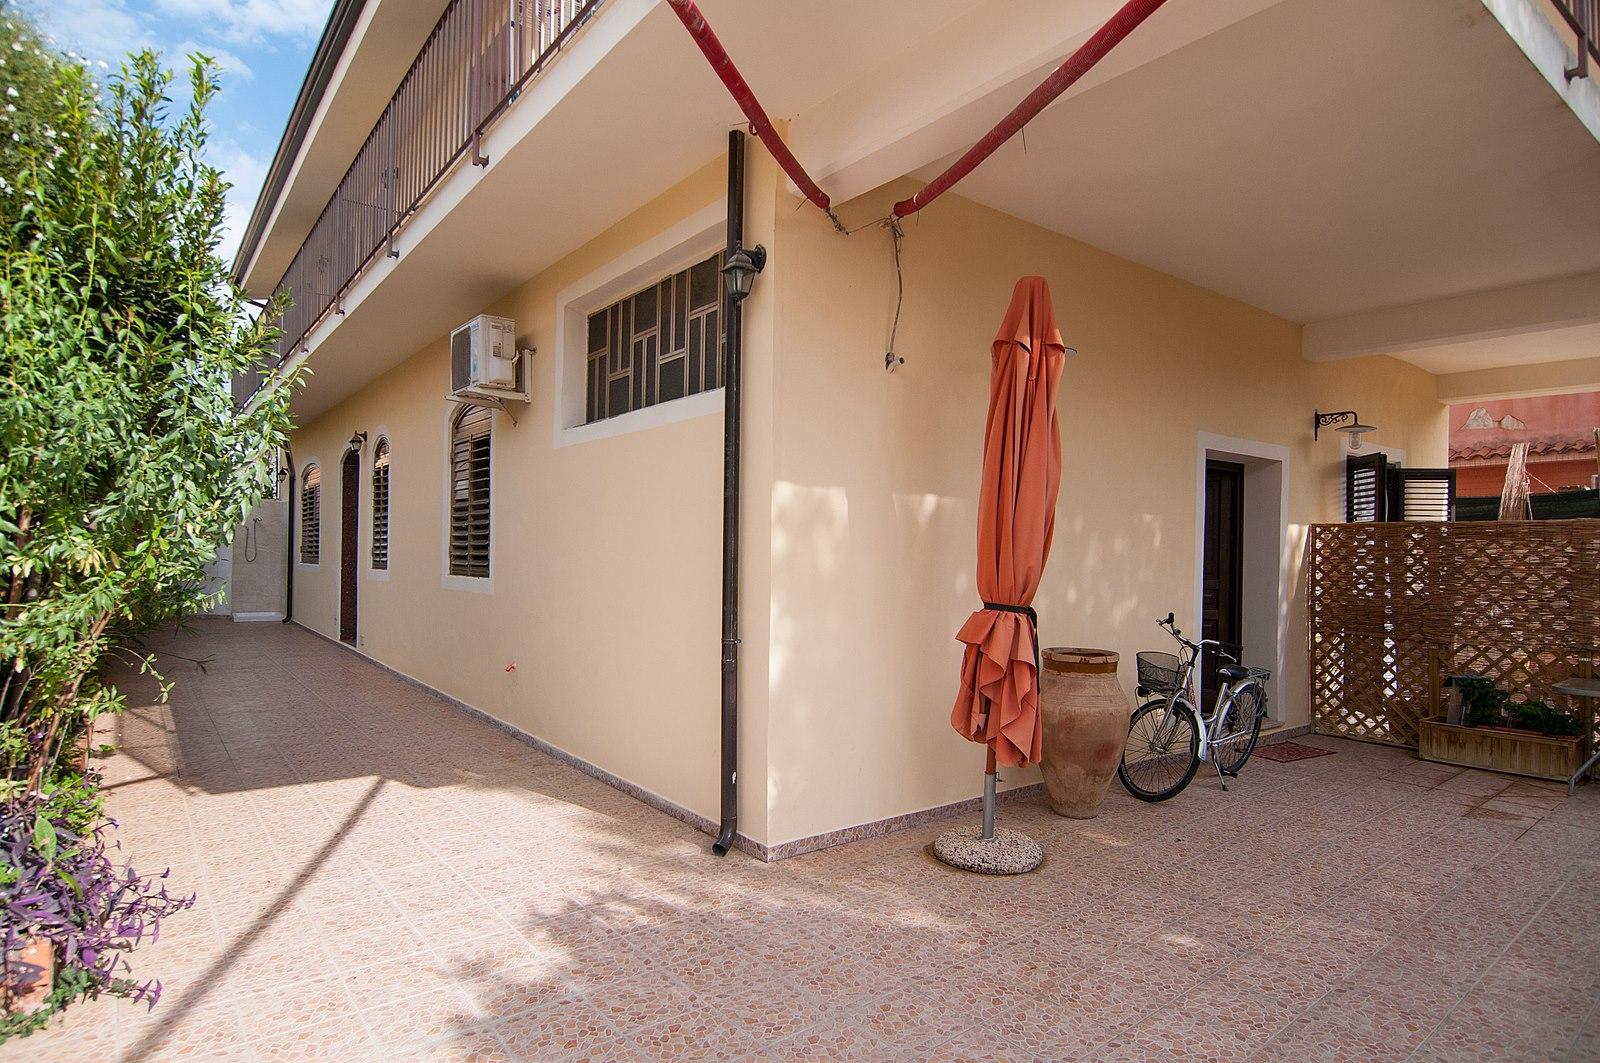 Appartement de vacances Casa Corrado (1540085), Avola, Siracusa, Sicile, Italie, image 15